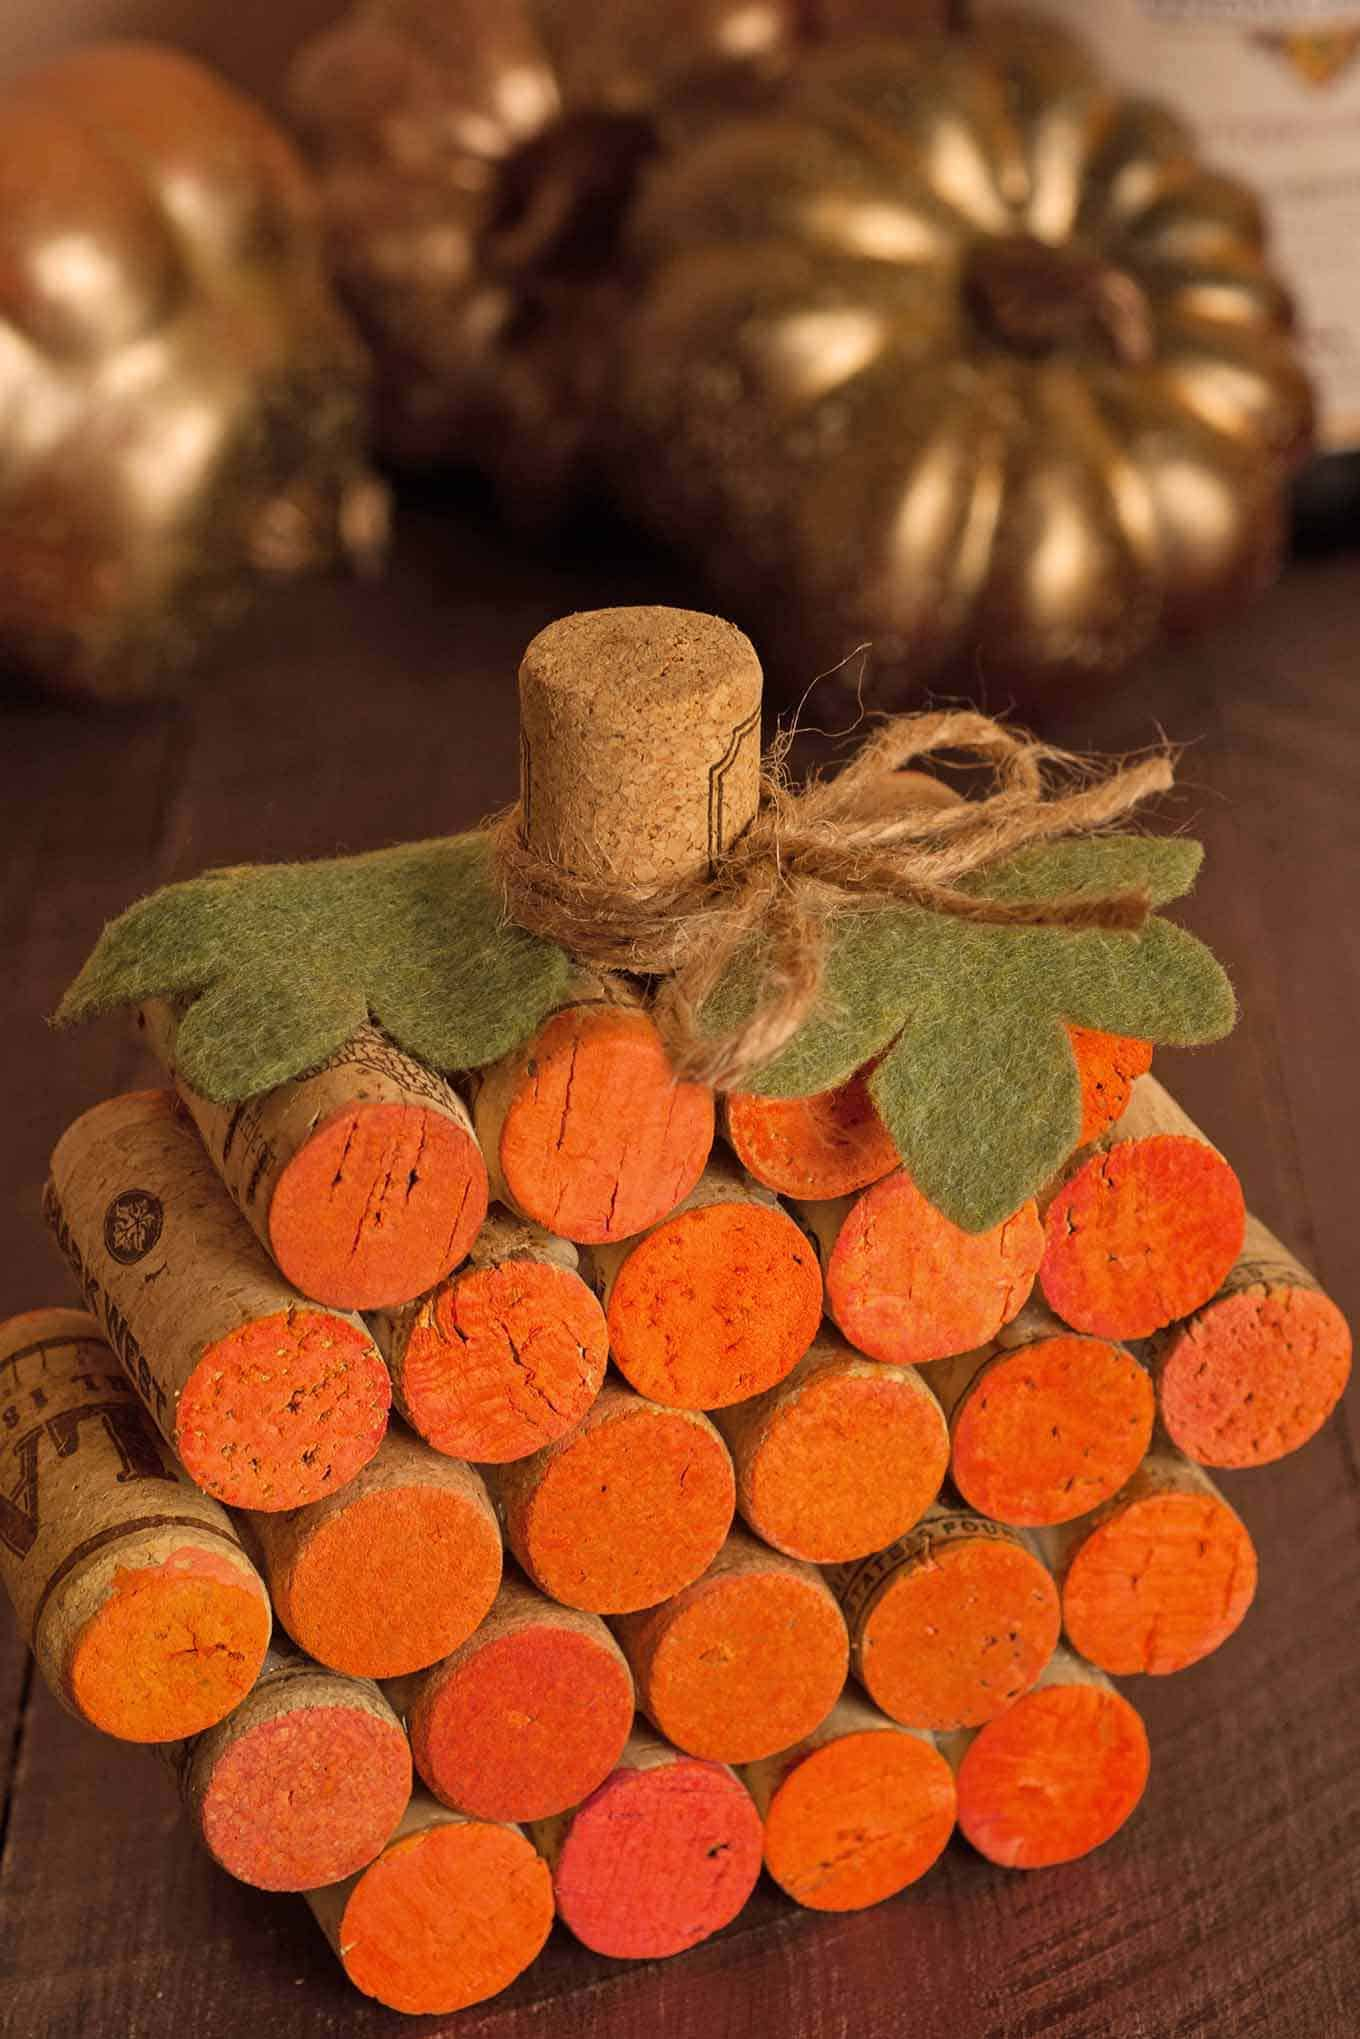 Diy Table Decor How To Make A Wine Cork Pumpkin